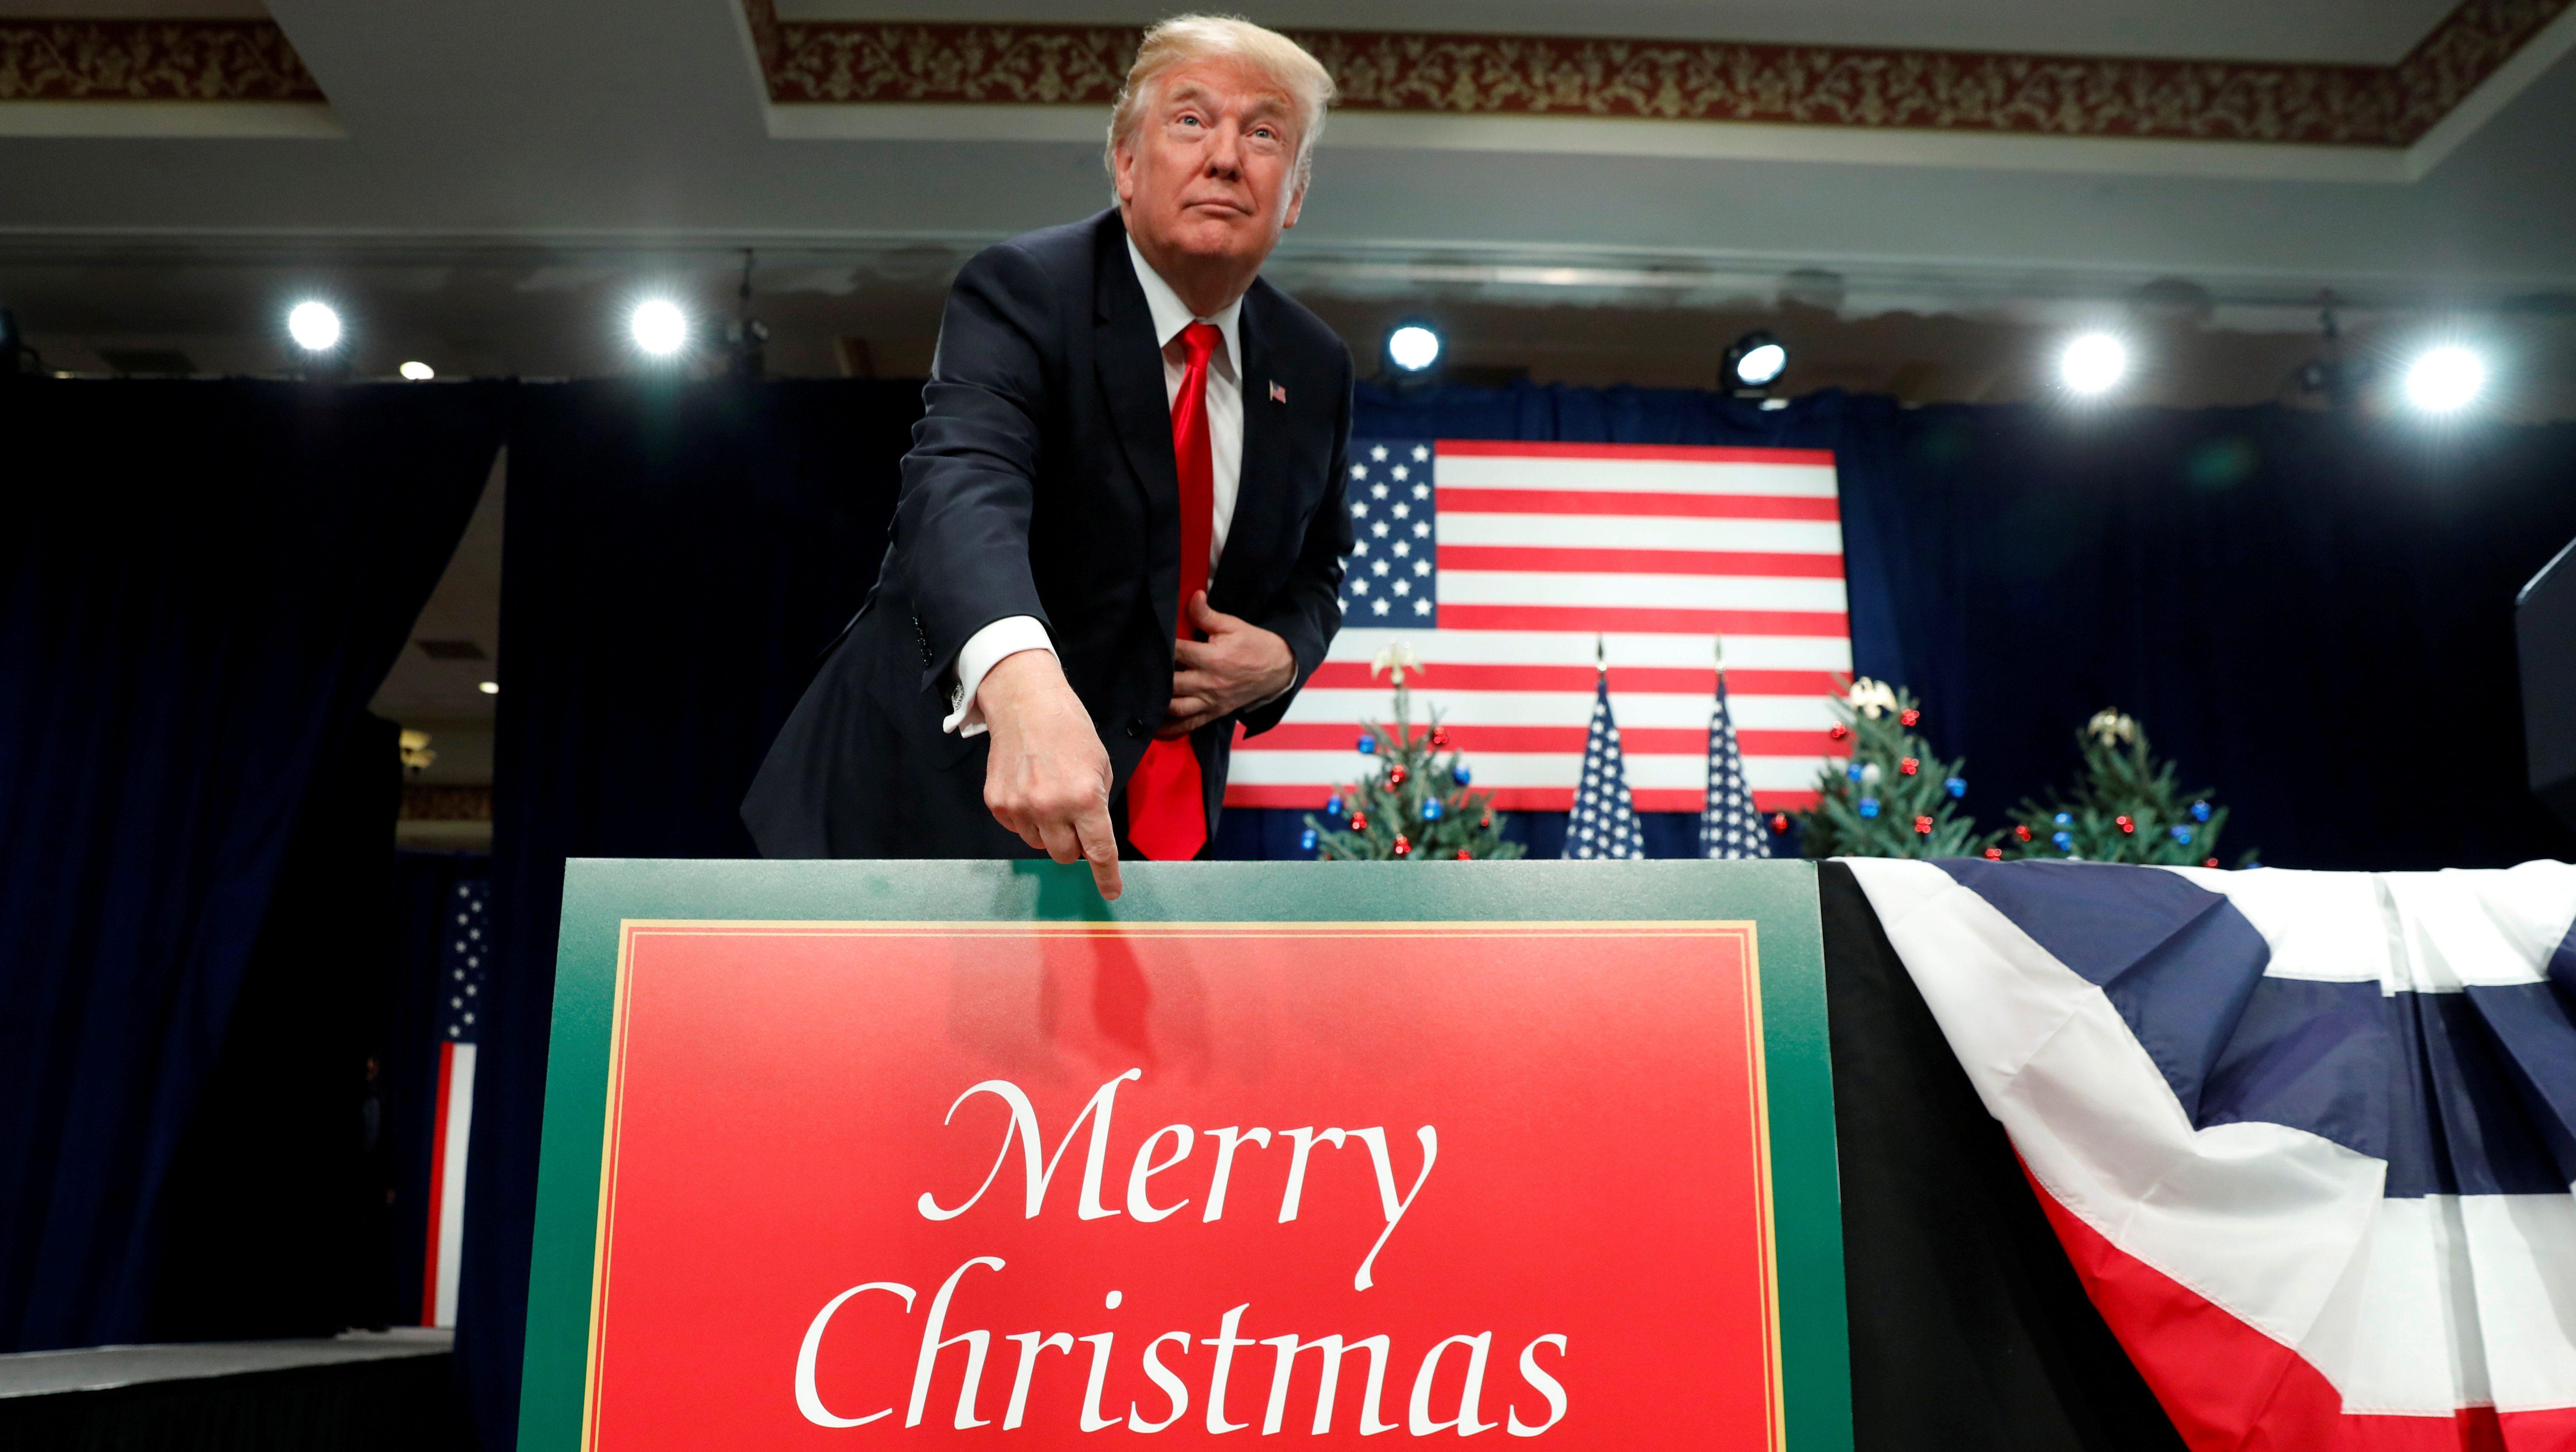 FILE PHOTO: U.S. President Trump visits St. Louis, Missouri to speak about tax reform